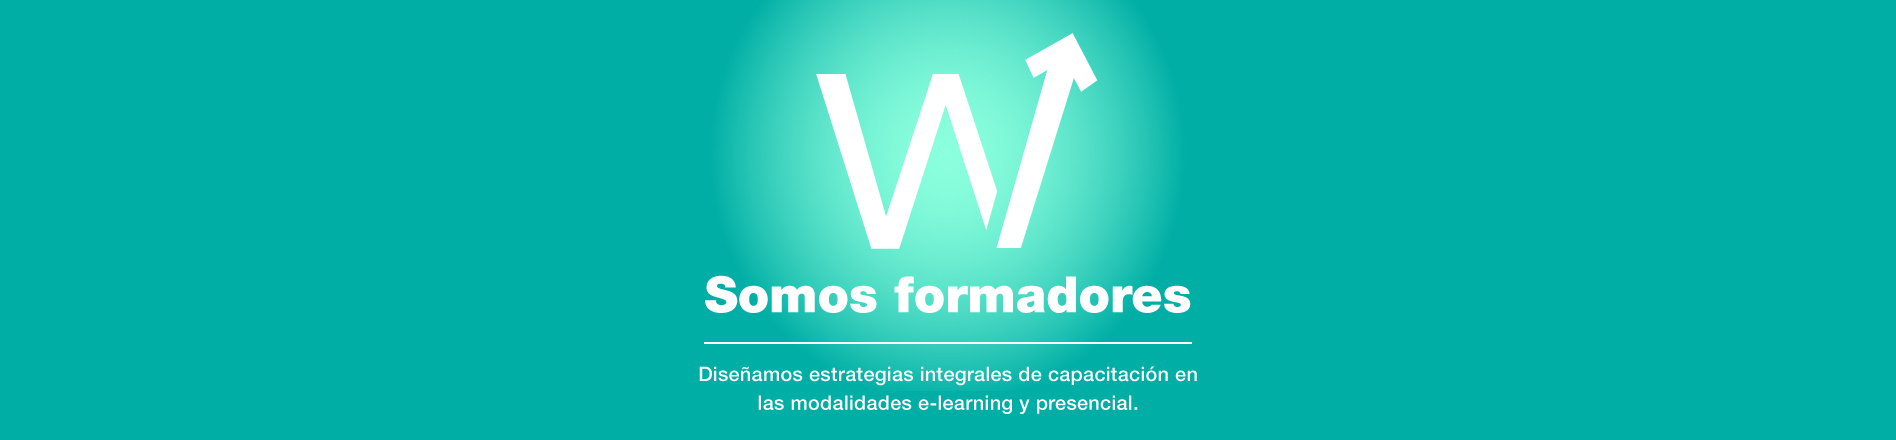 GWP_WEB_Carrusel_Formacion2